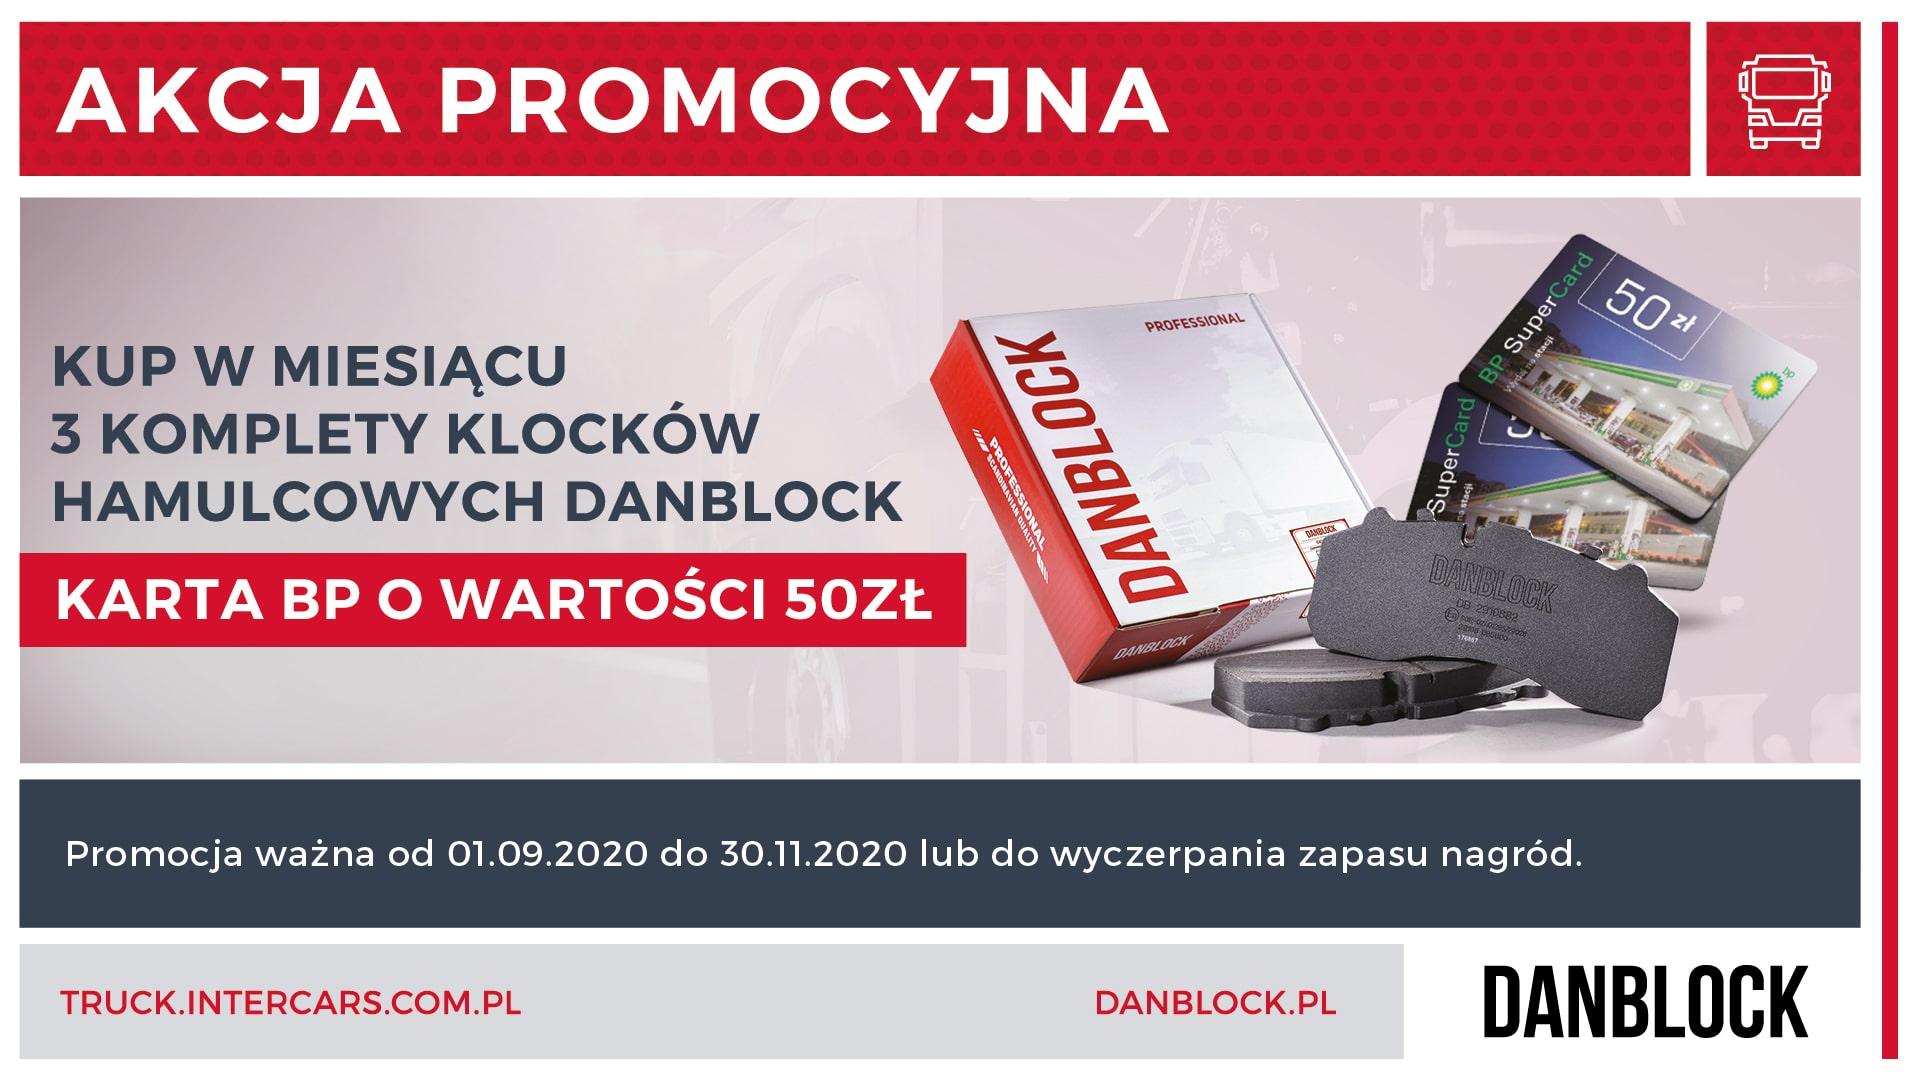 Danblock_Inter Cars_promocja.jpg